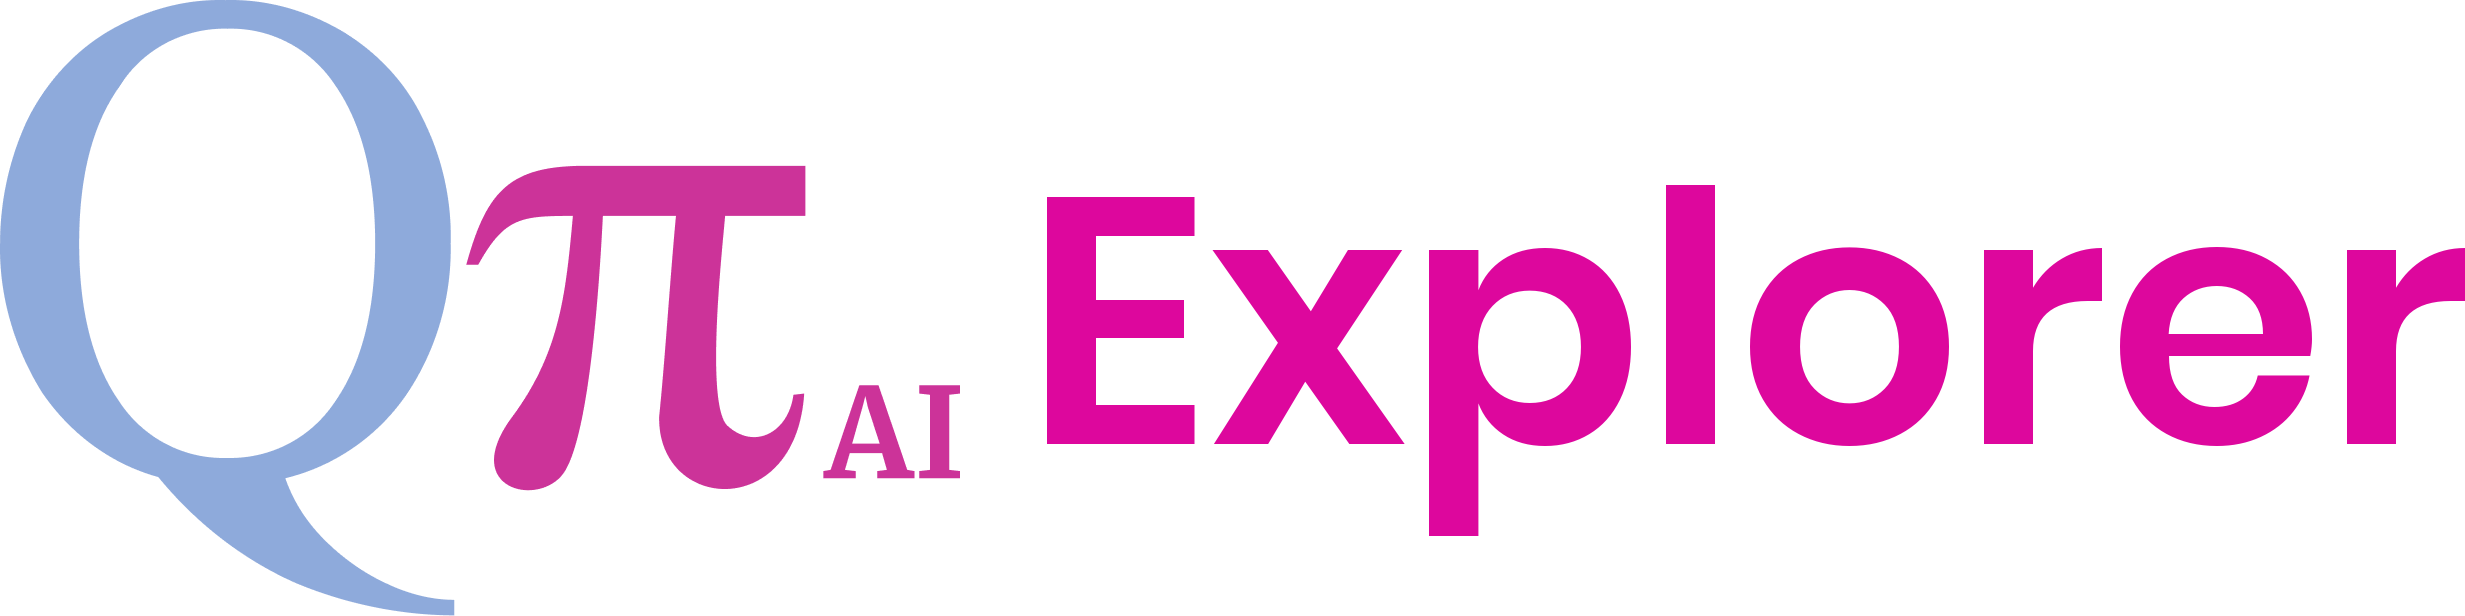 QpiAI Explorer